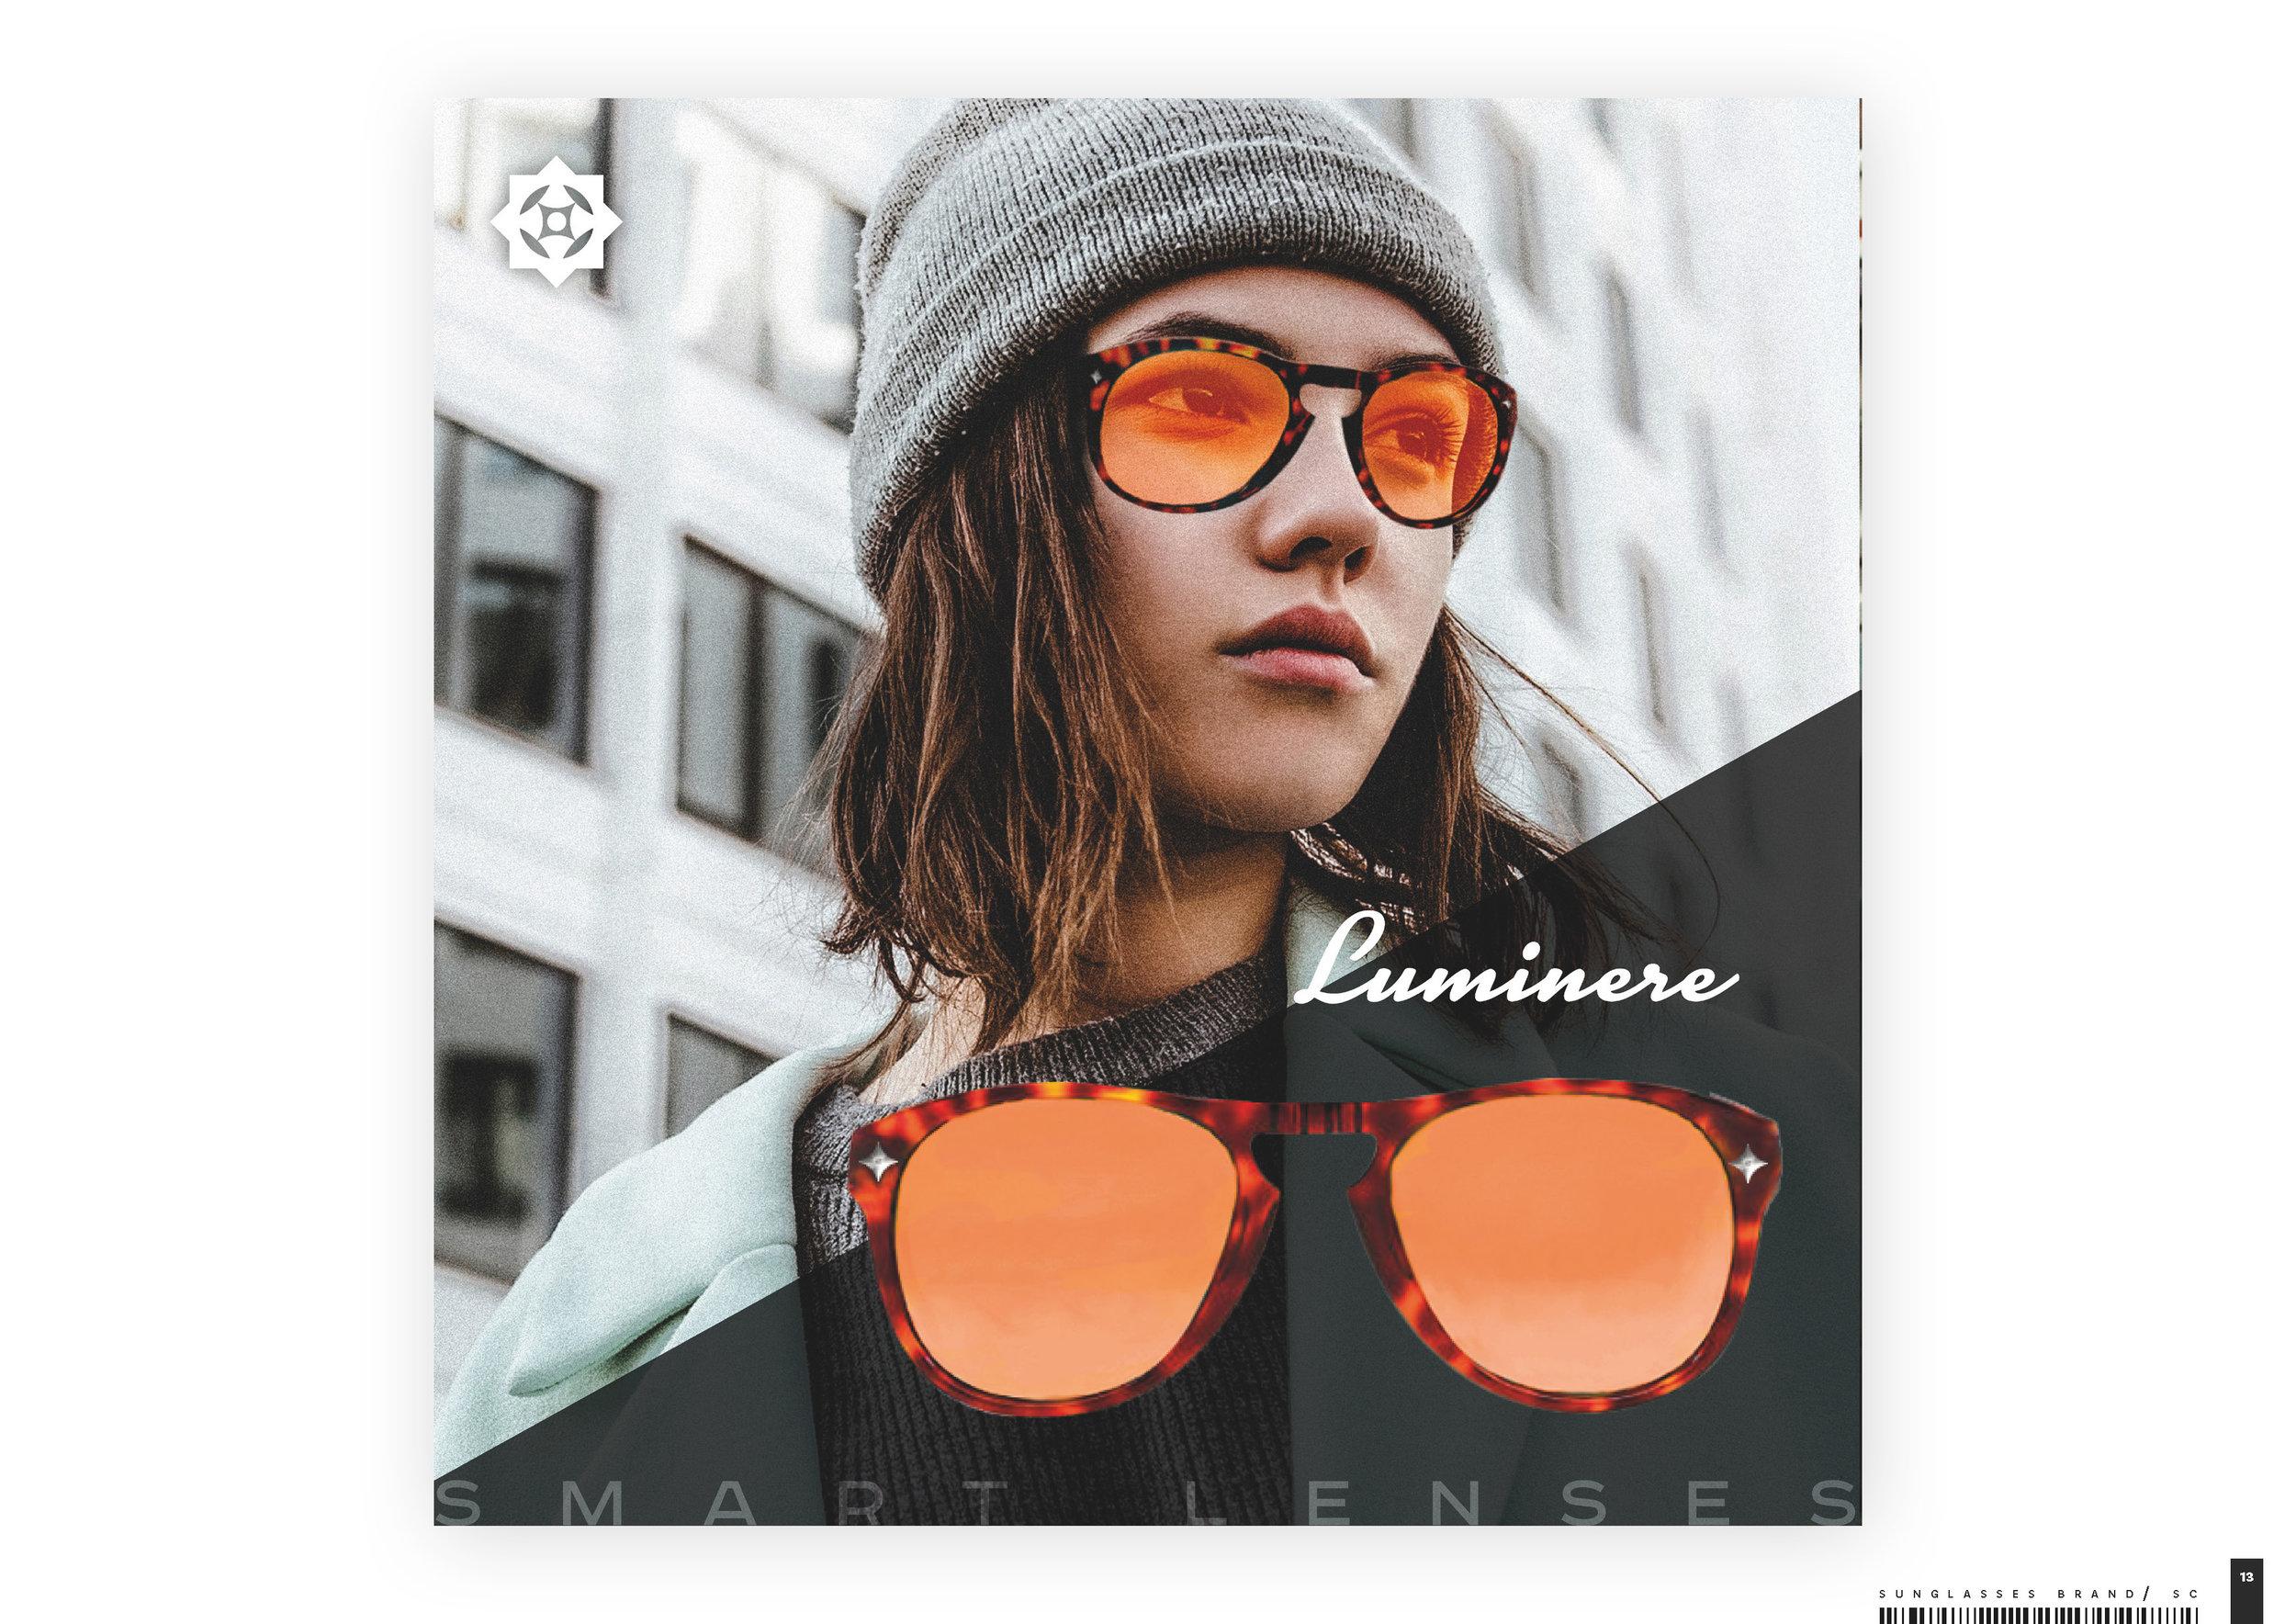 SC_luminere_ID_Amazon+_Página_6.jpg